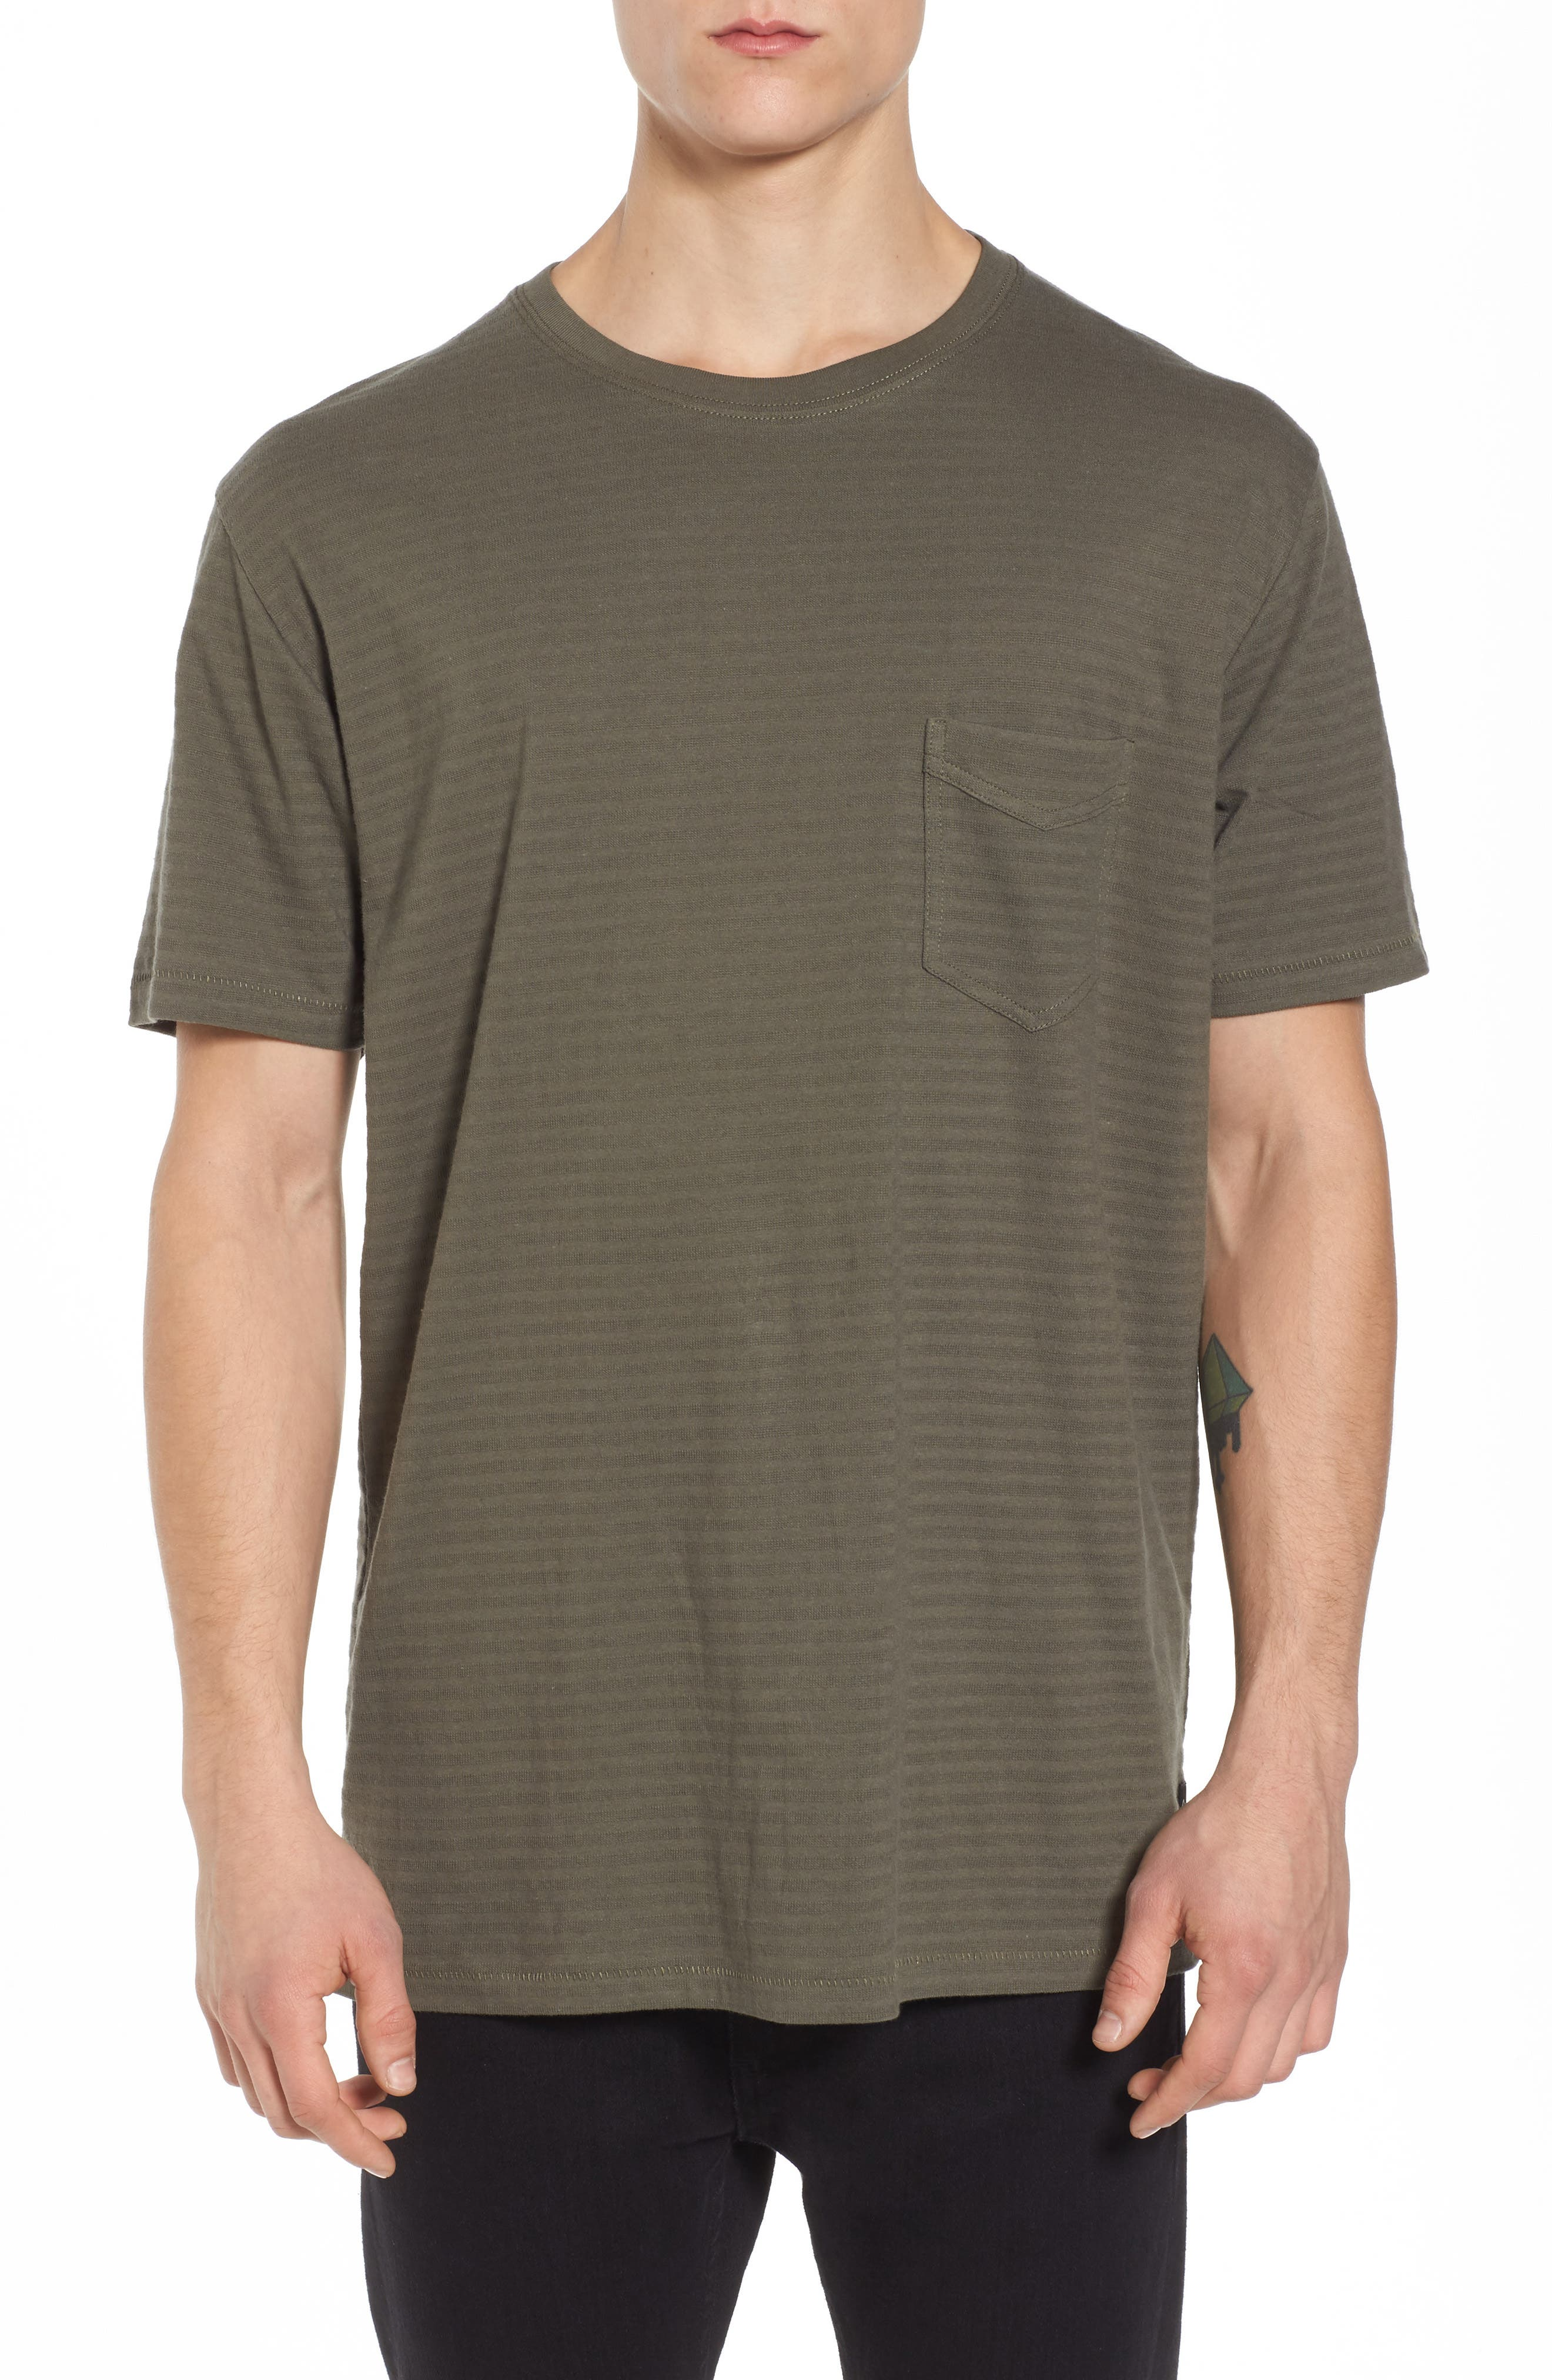 Barney Cools B. Elusive Pocket T-Shirt